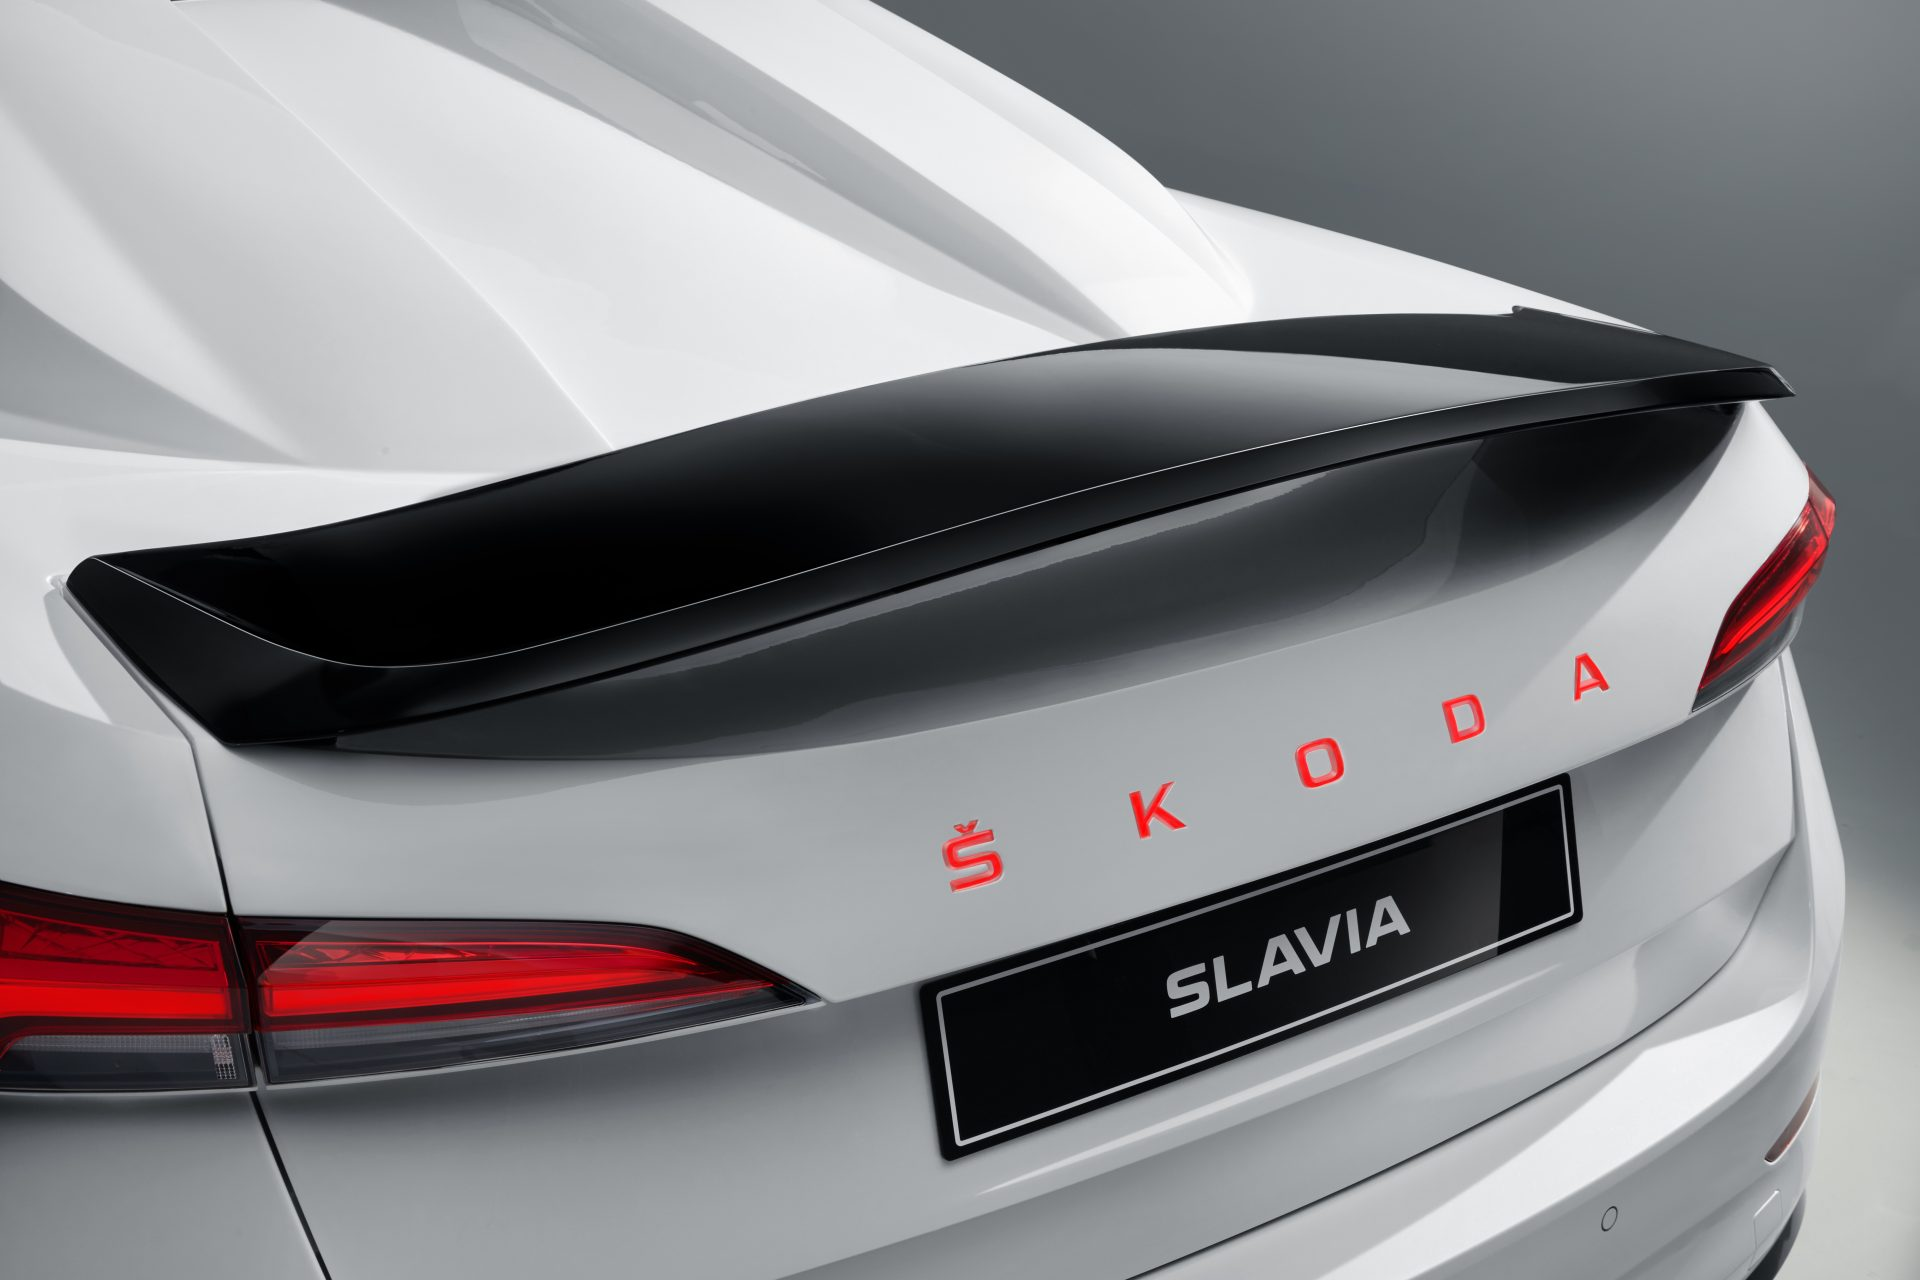 05_SKODA_SLAVIA_studio-1920x1280